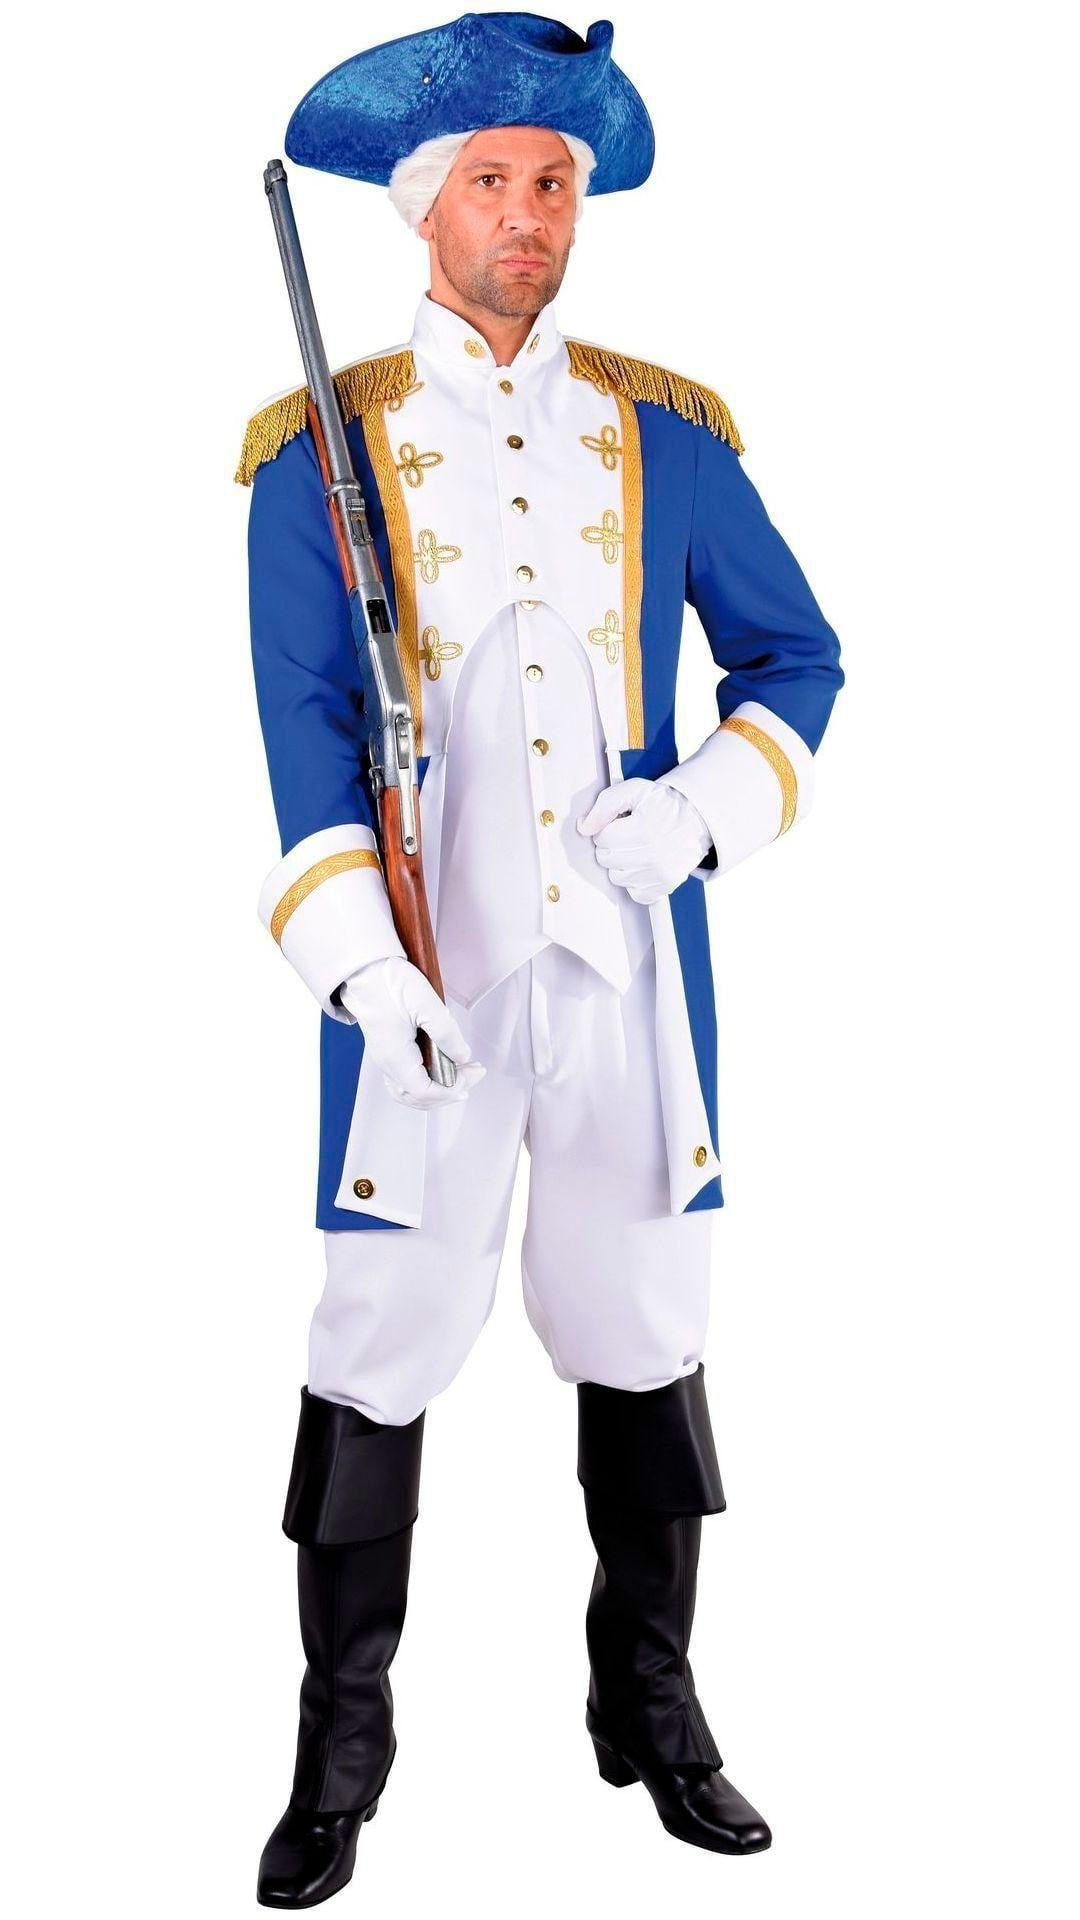 Blauwe officiers jas man